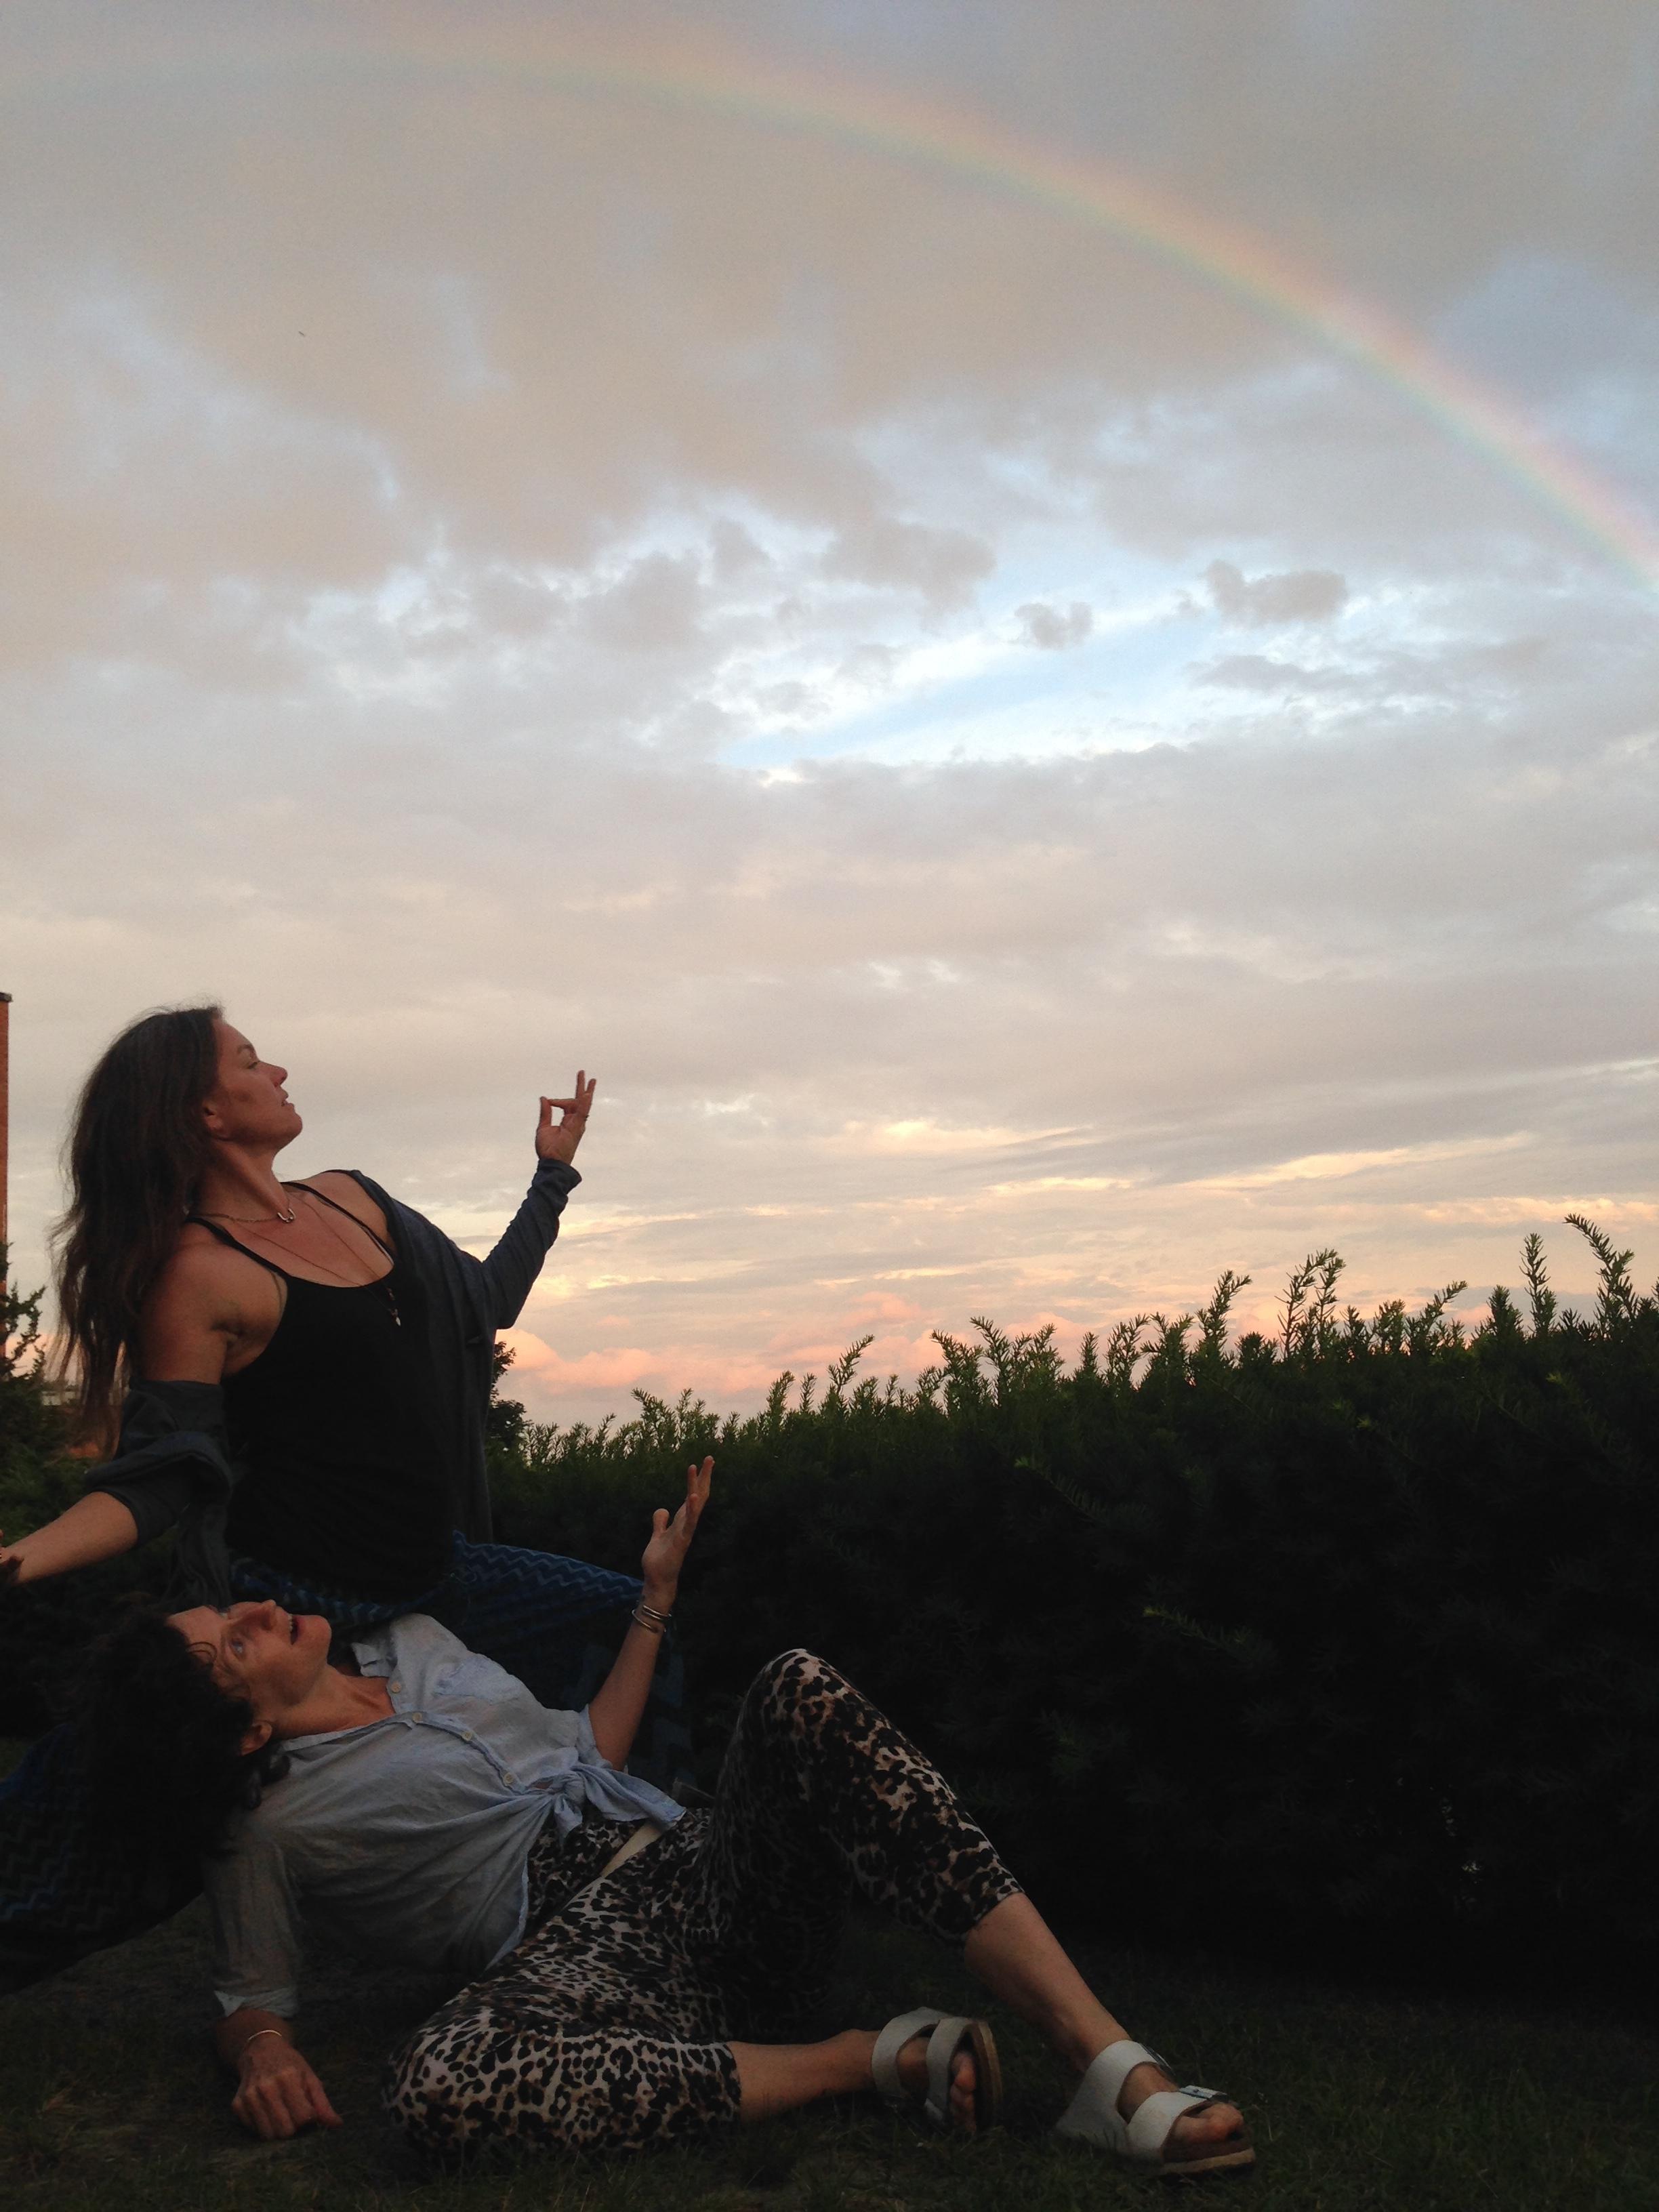 Erin & Alex & a Rainbow